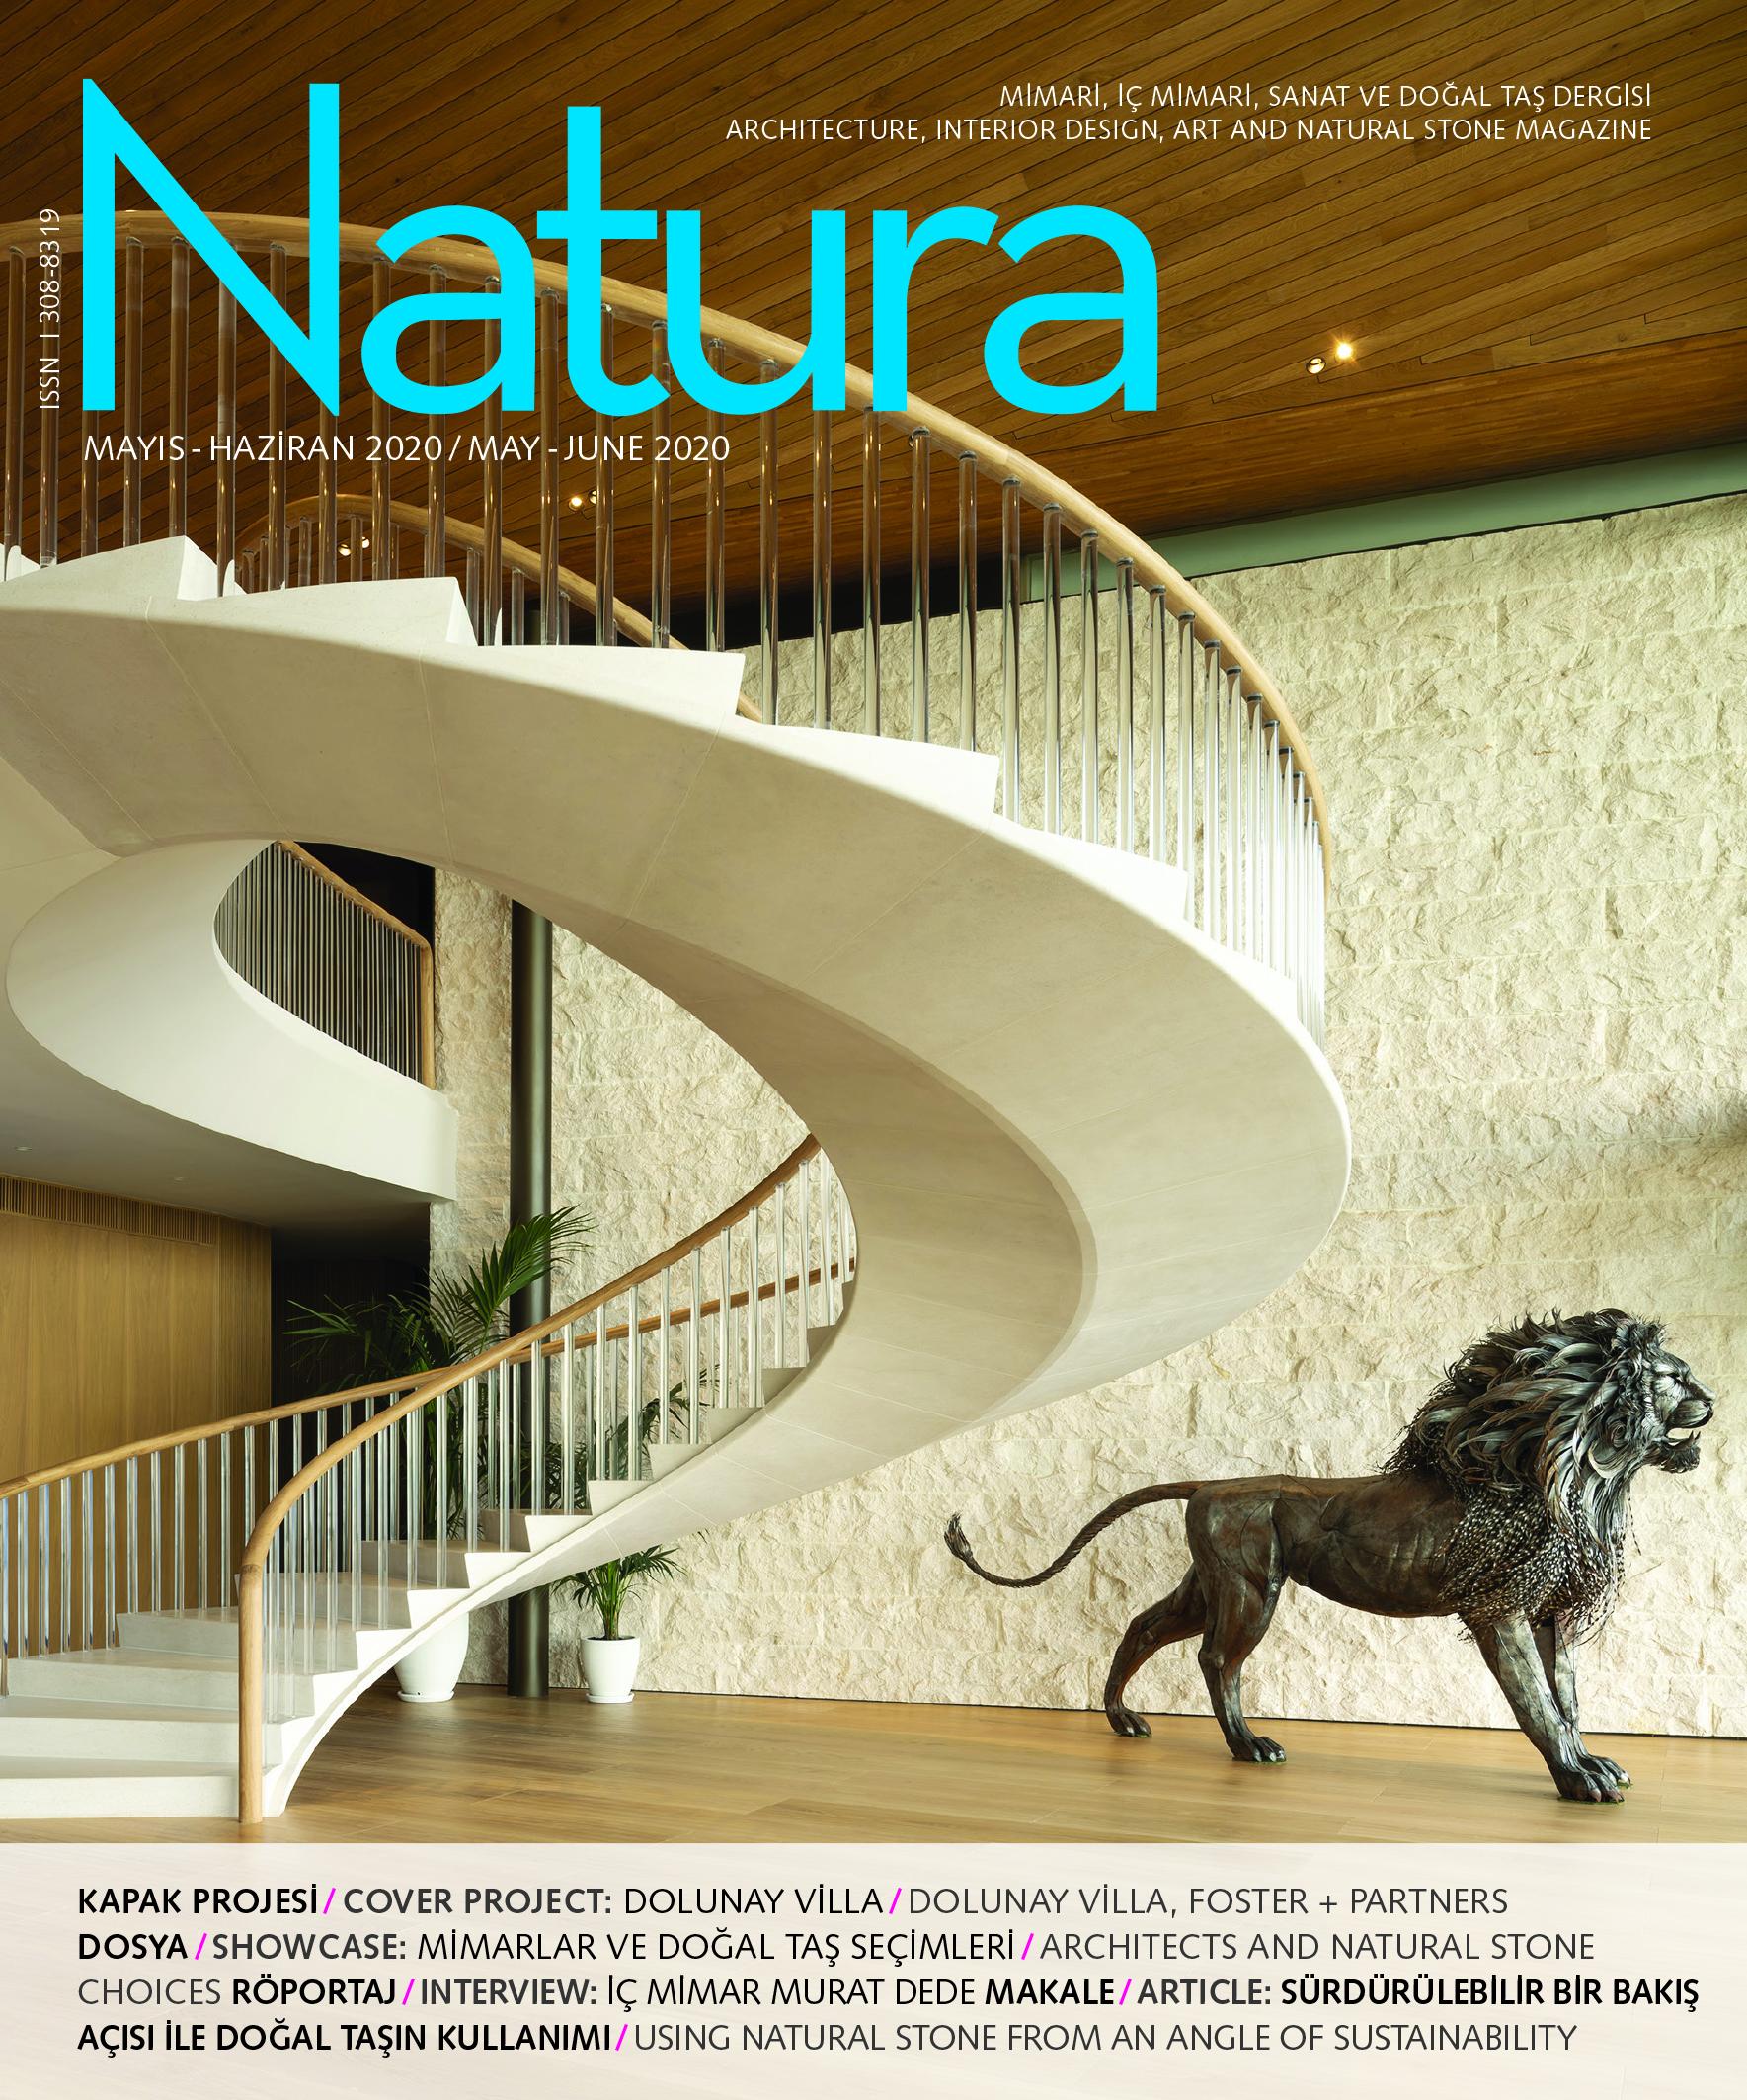 Natura Mayıs-Haziran / Natura May-June